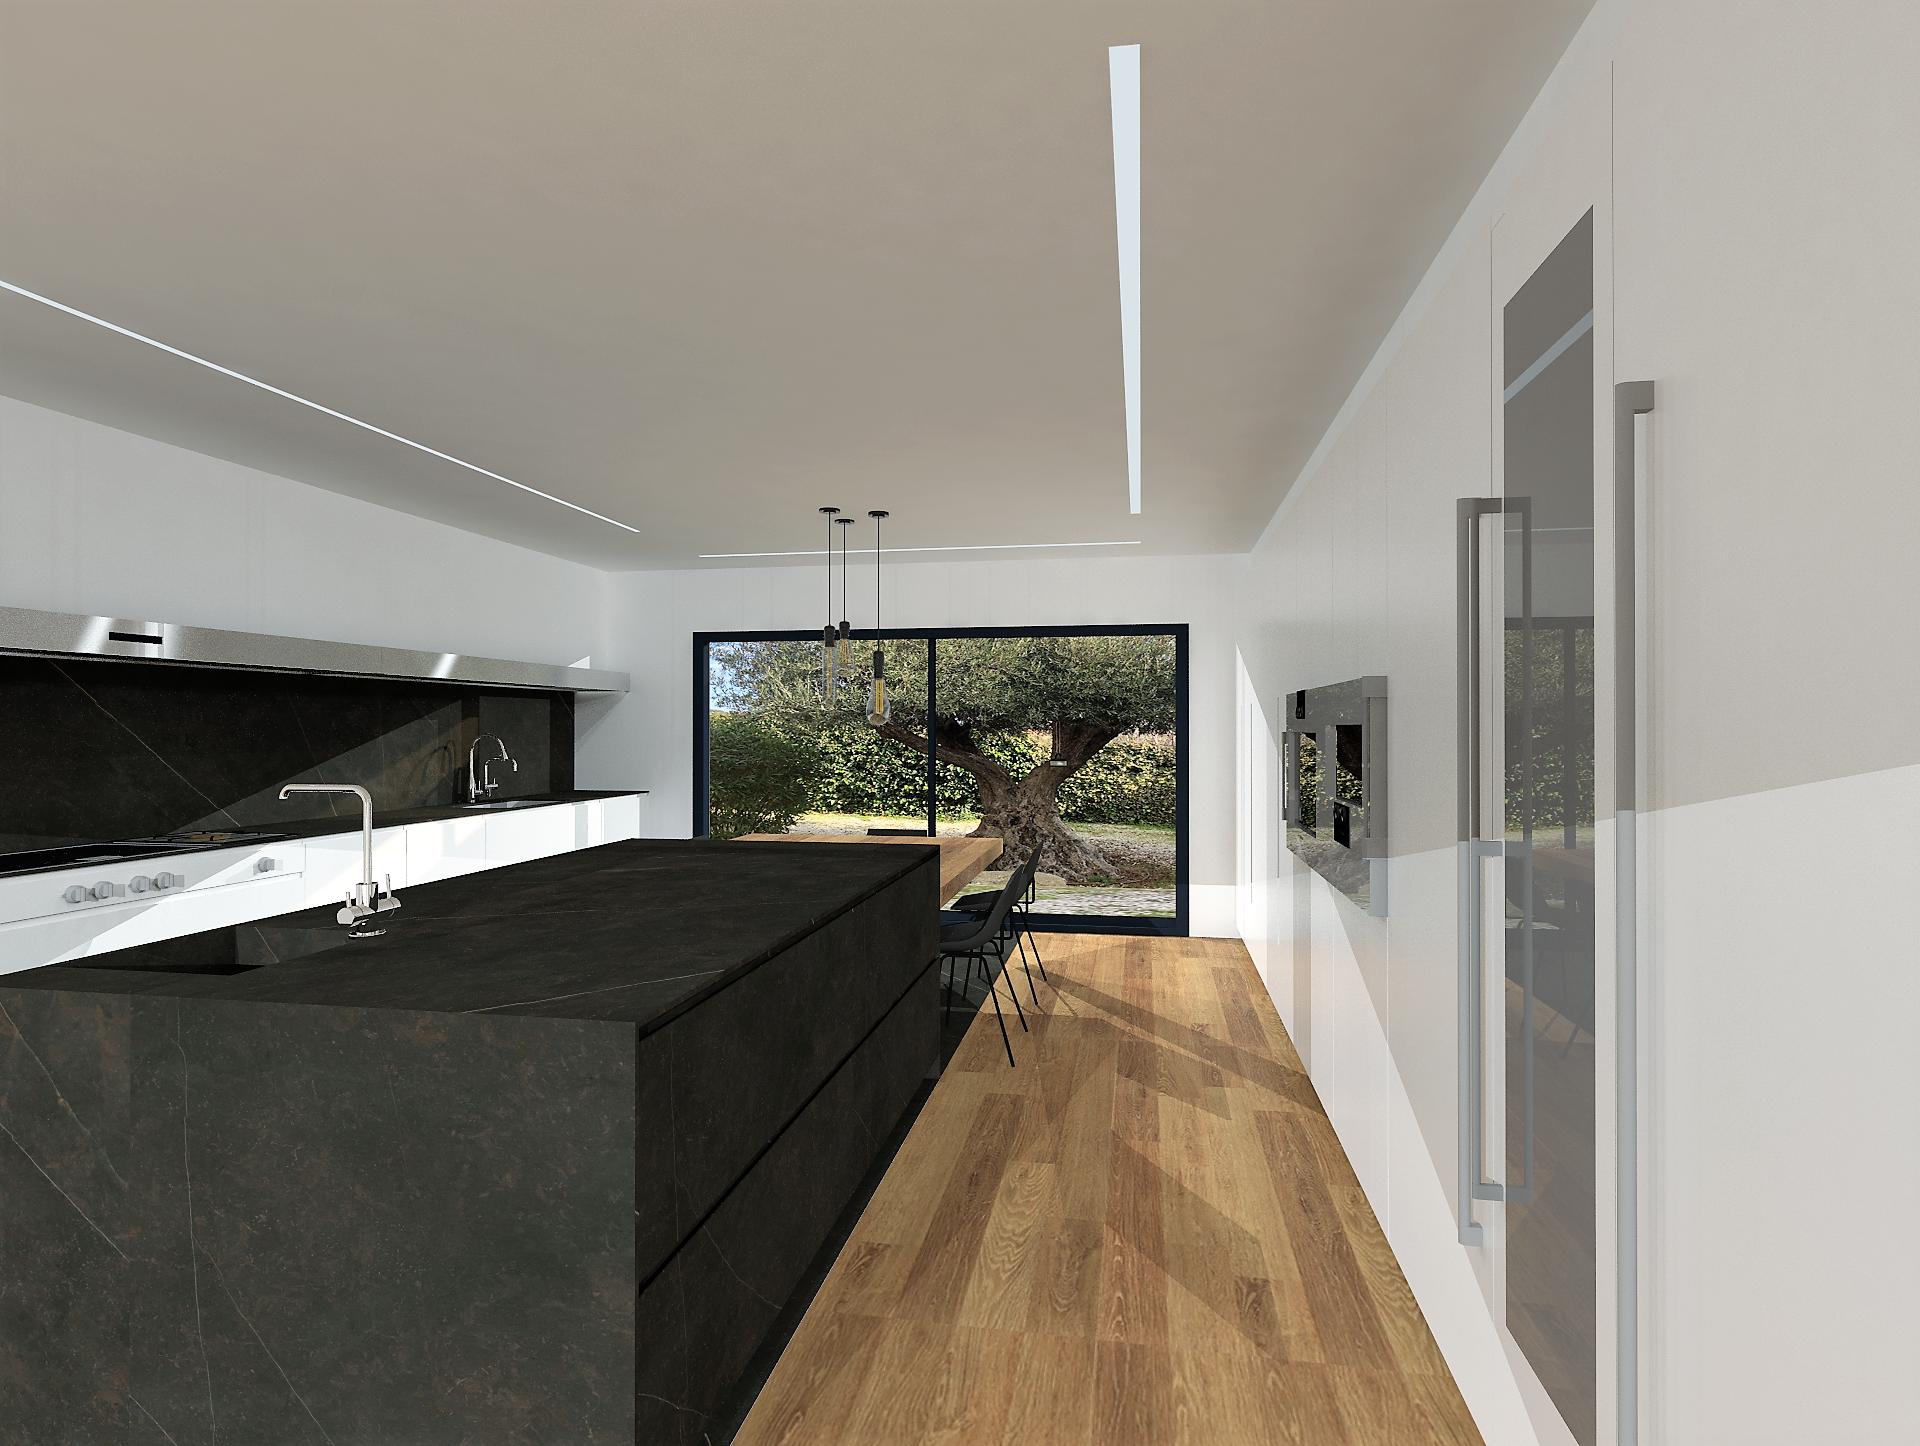 Proyecto 1 con muebles de cocina Auró Kitchens